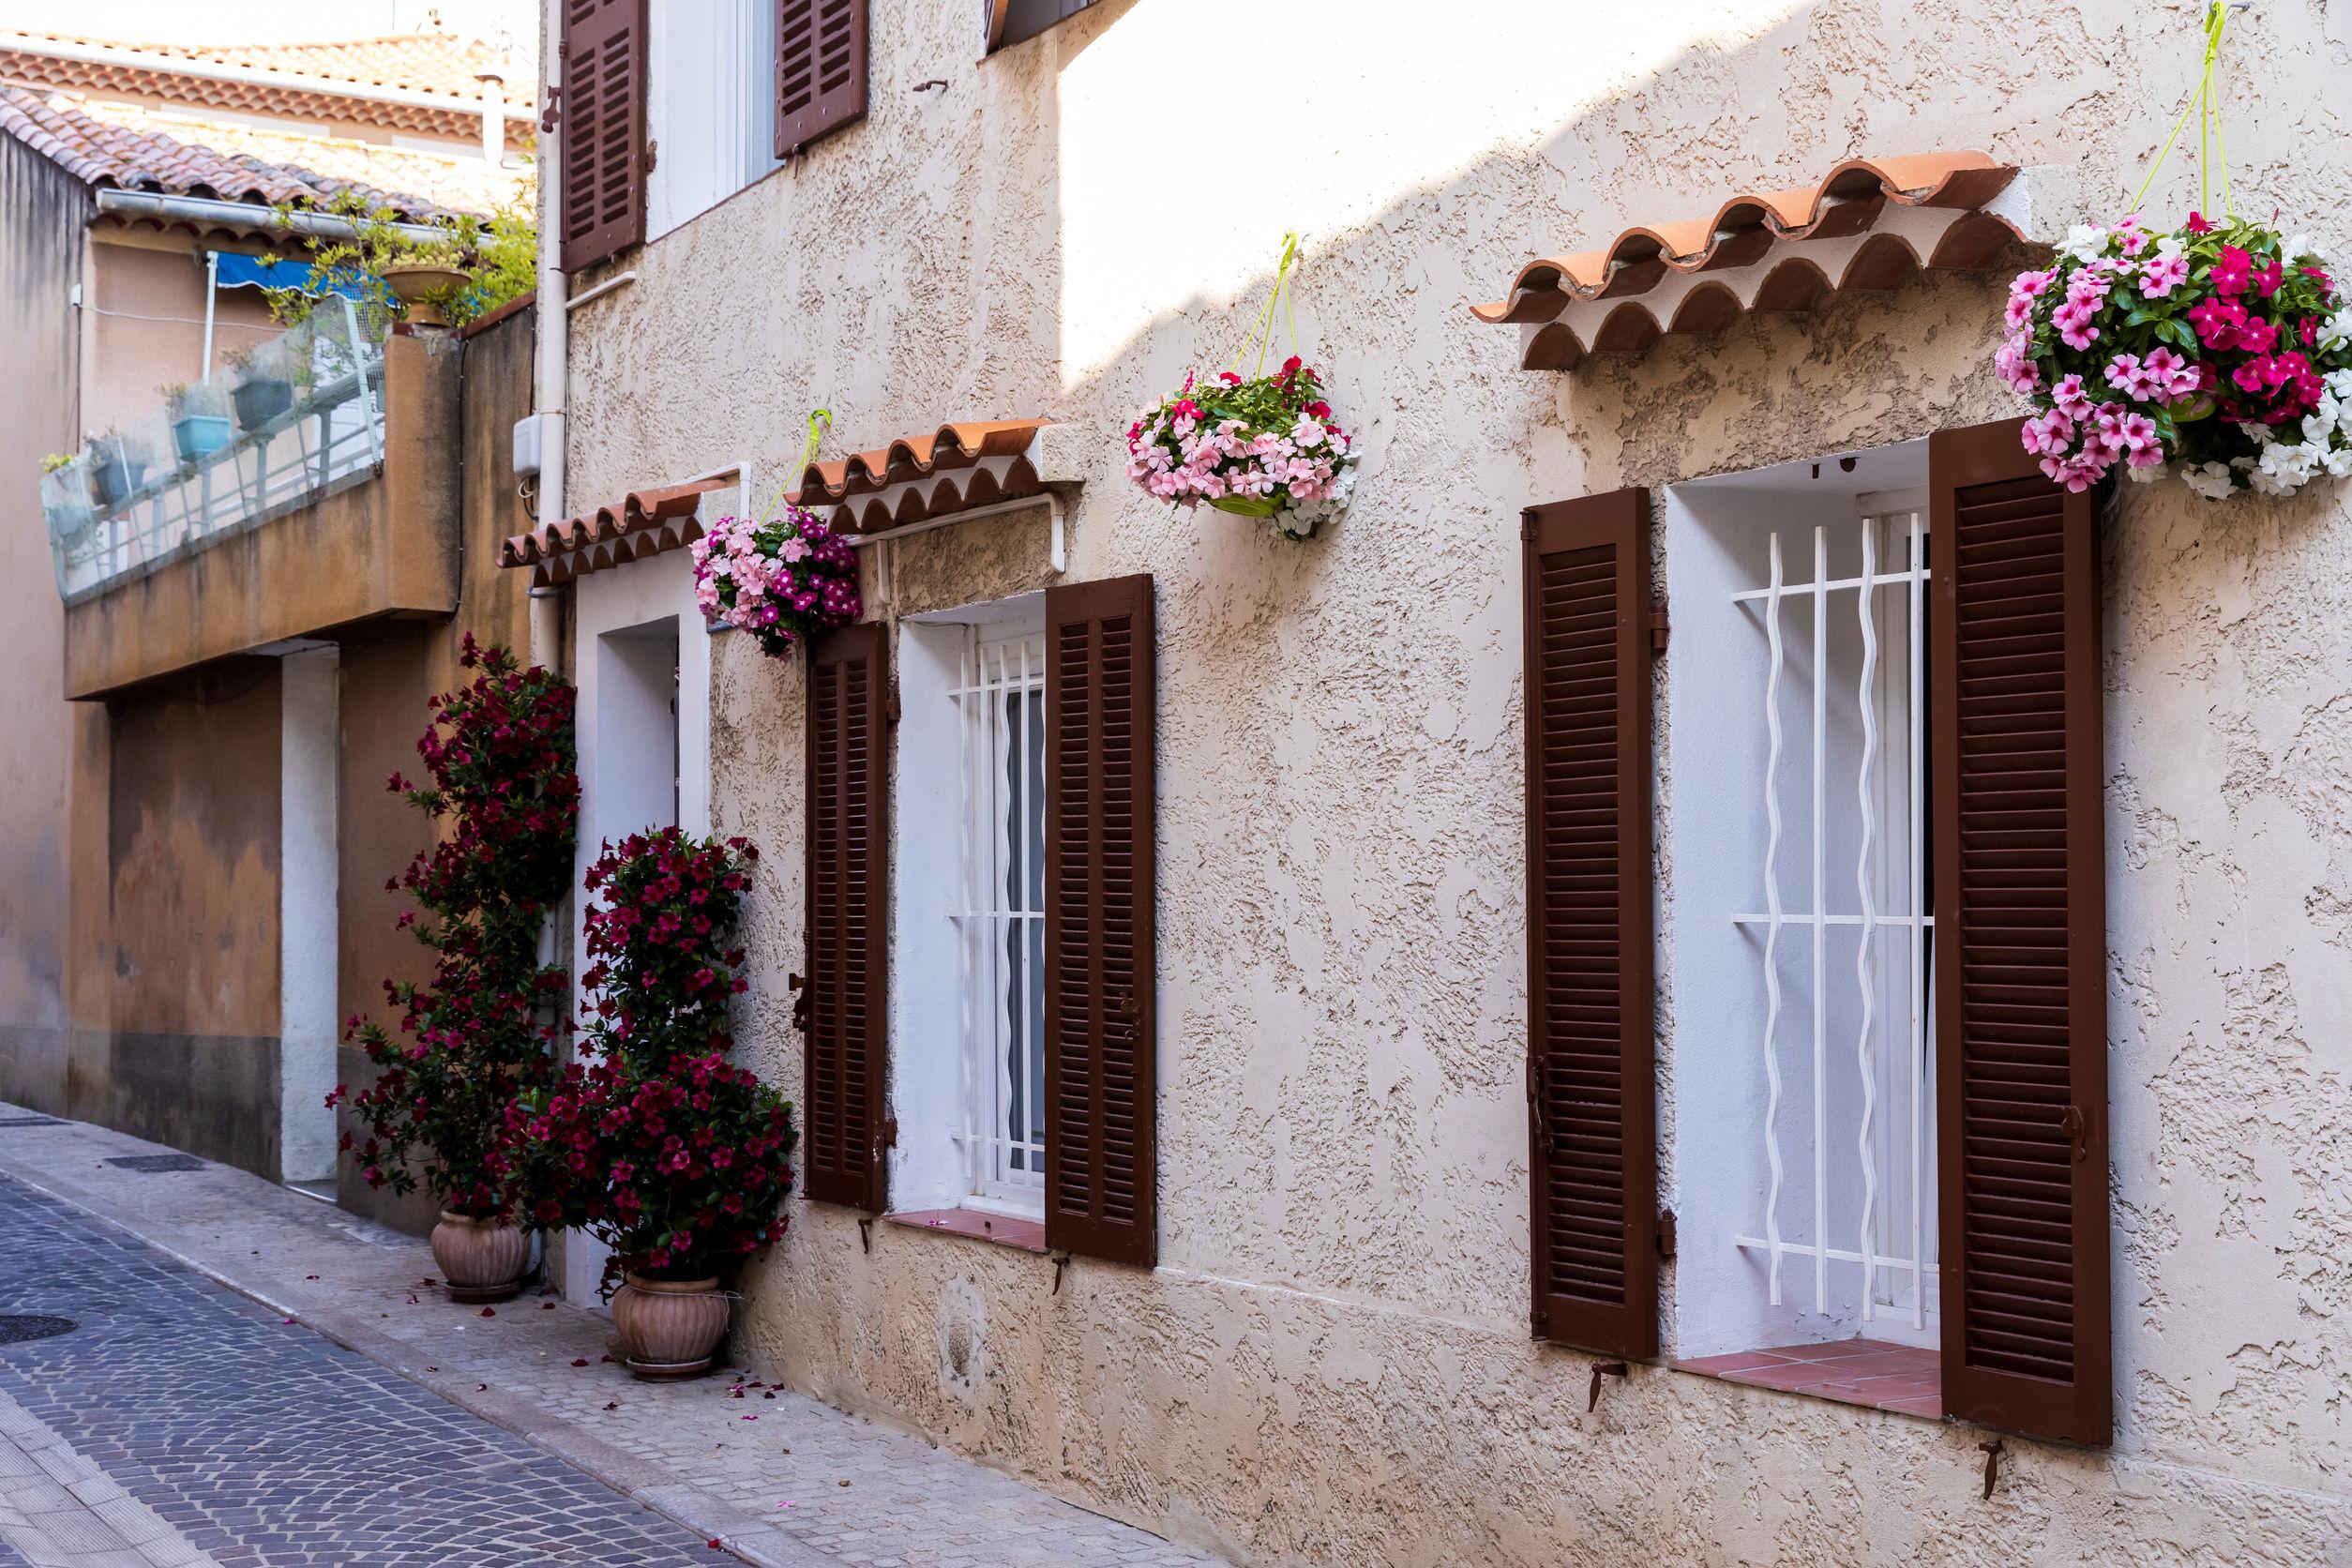 mur en crépi, crépi de façade extérieure